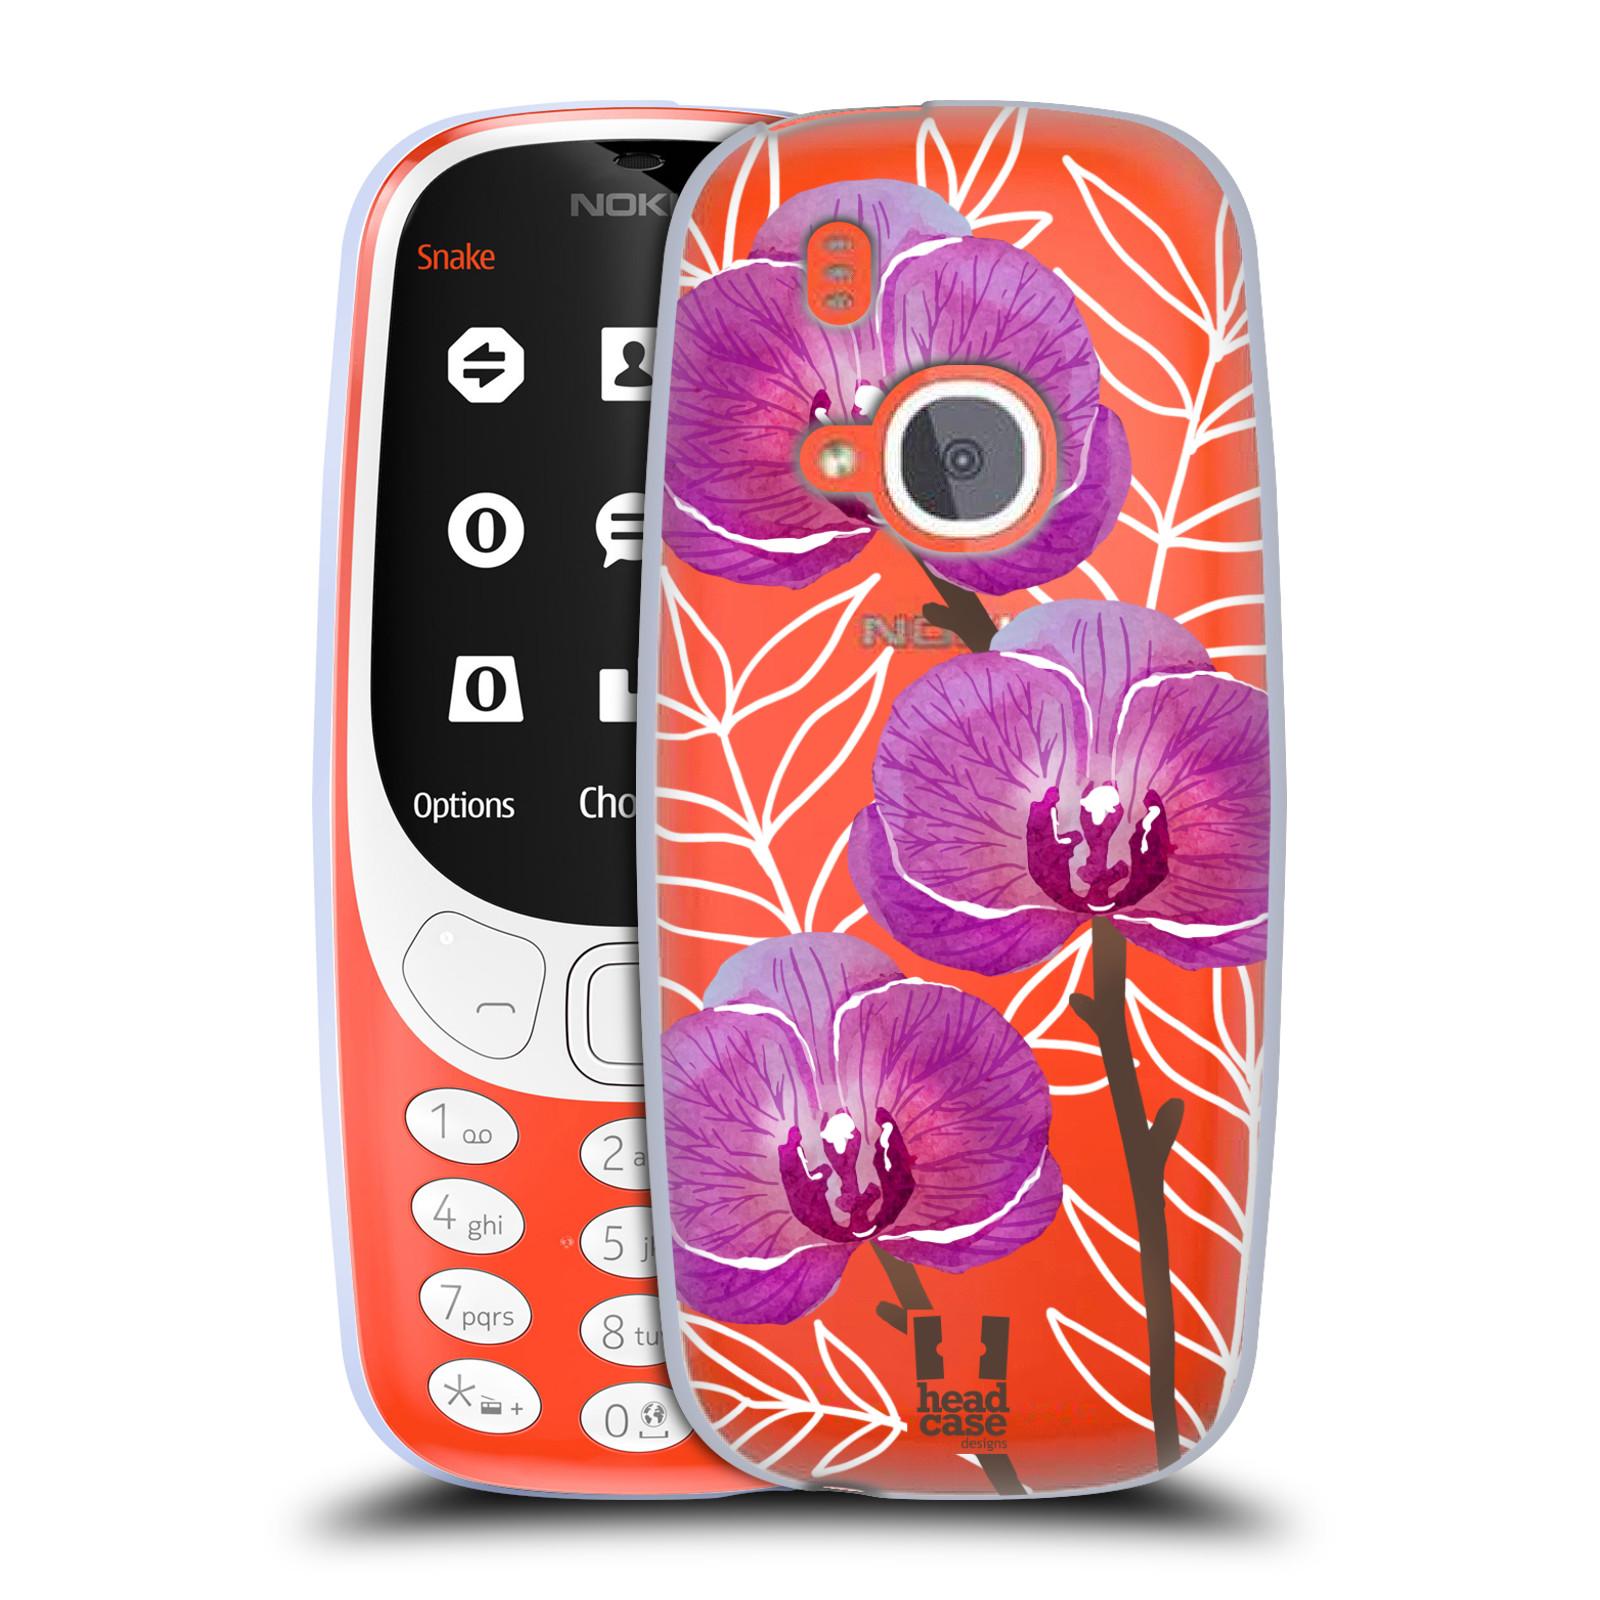 Silikonové pouzdro na mobil Nokia 3310 - Head Case - Hezoučké kvítky - průhledné